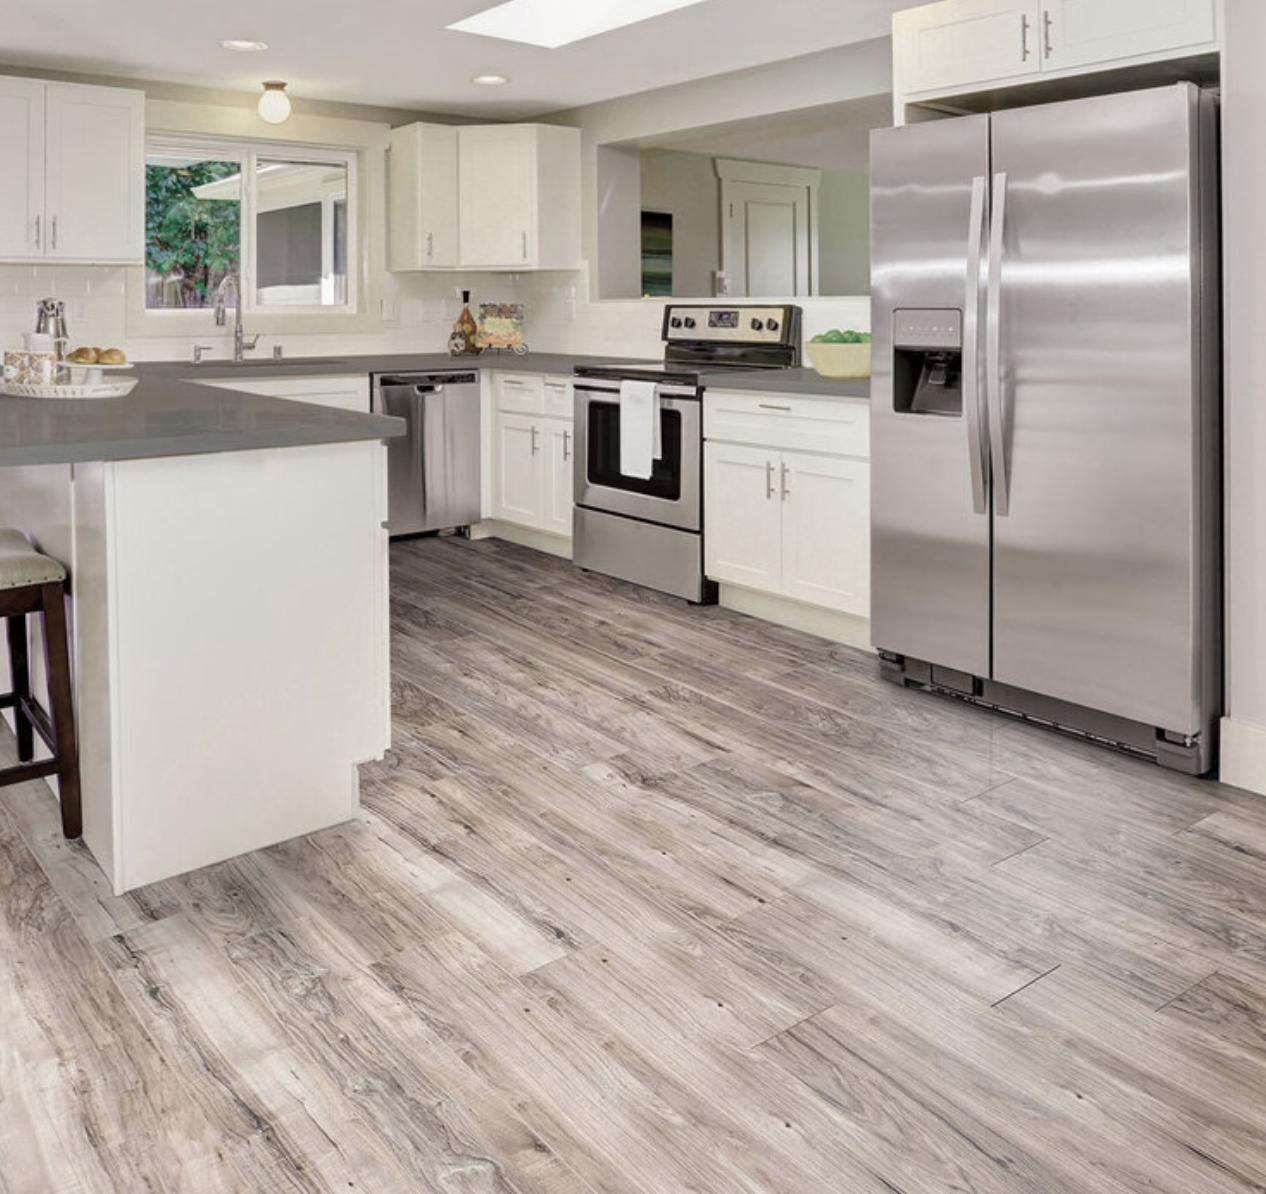 Golden Select Grey (Walnut) Splash Shield AC5 Laminate Flooring with Foam Underlay - 1.146 m² Per Pack - £15.58 @ Costco